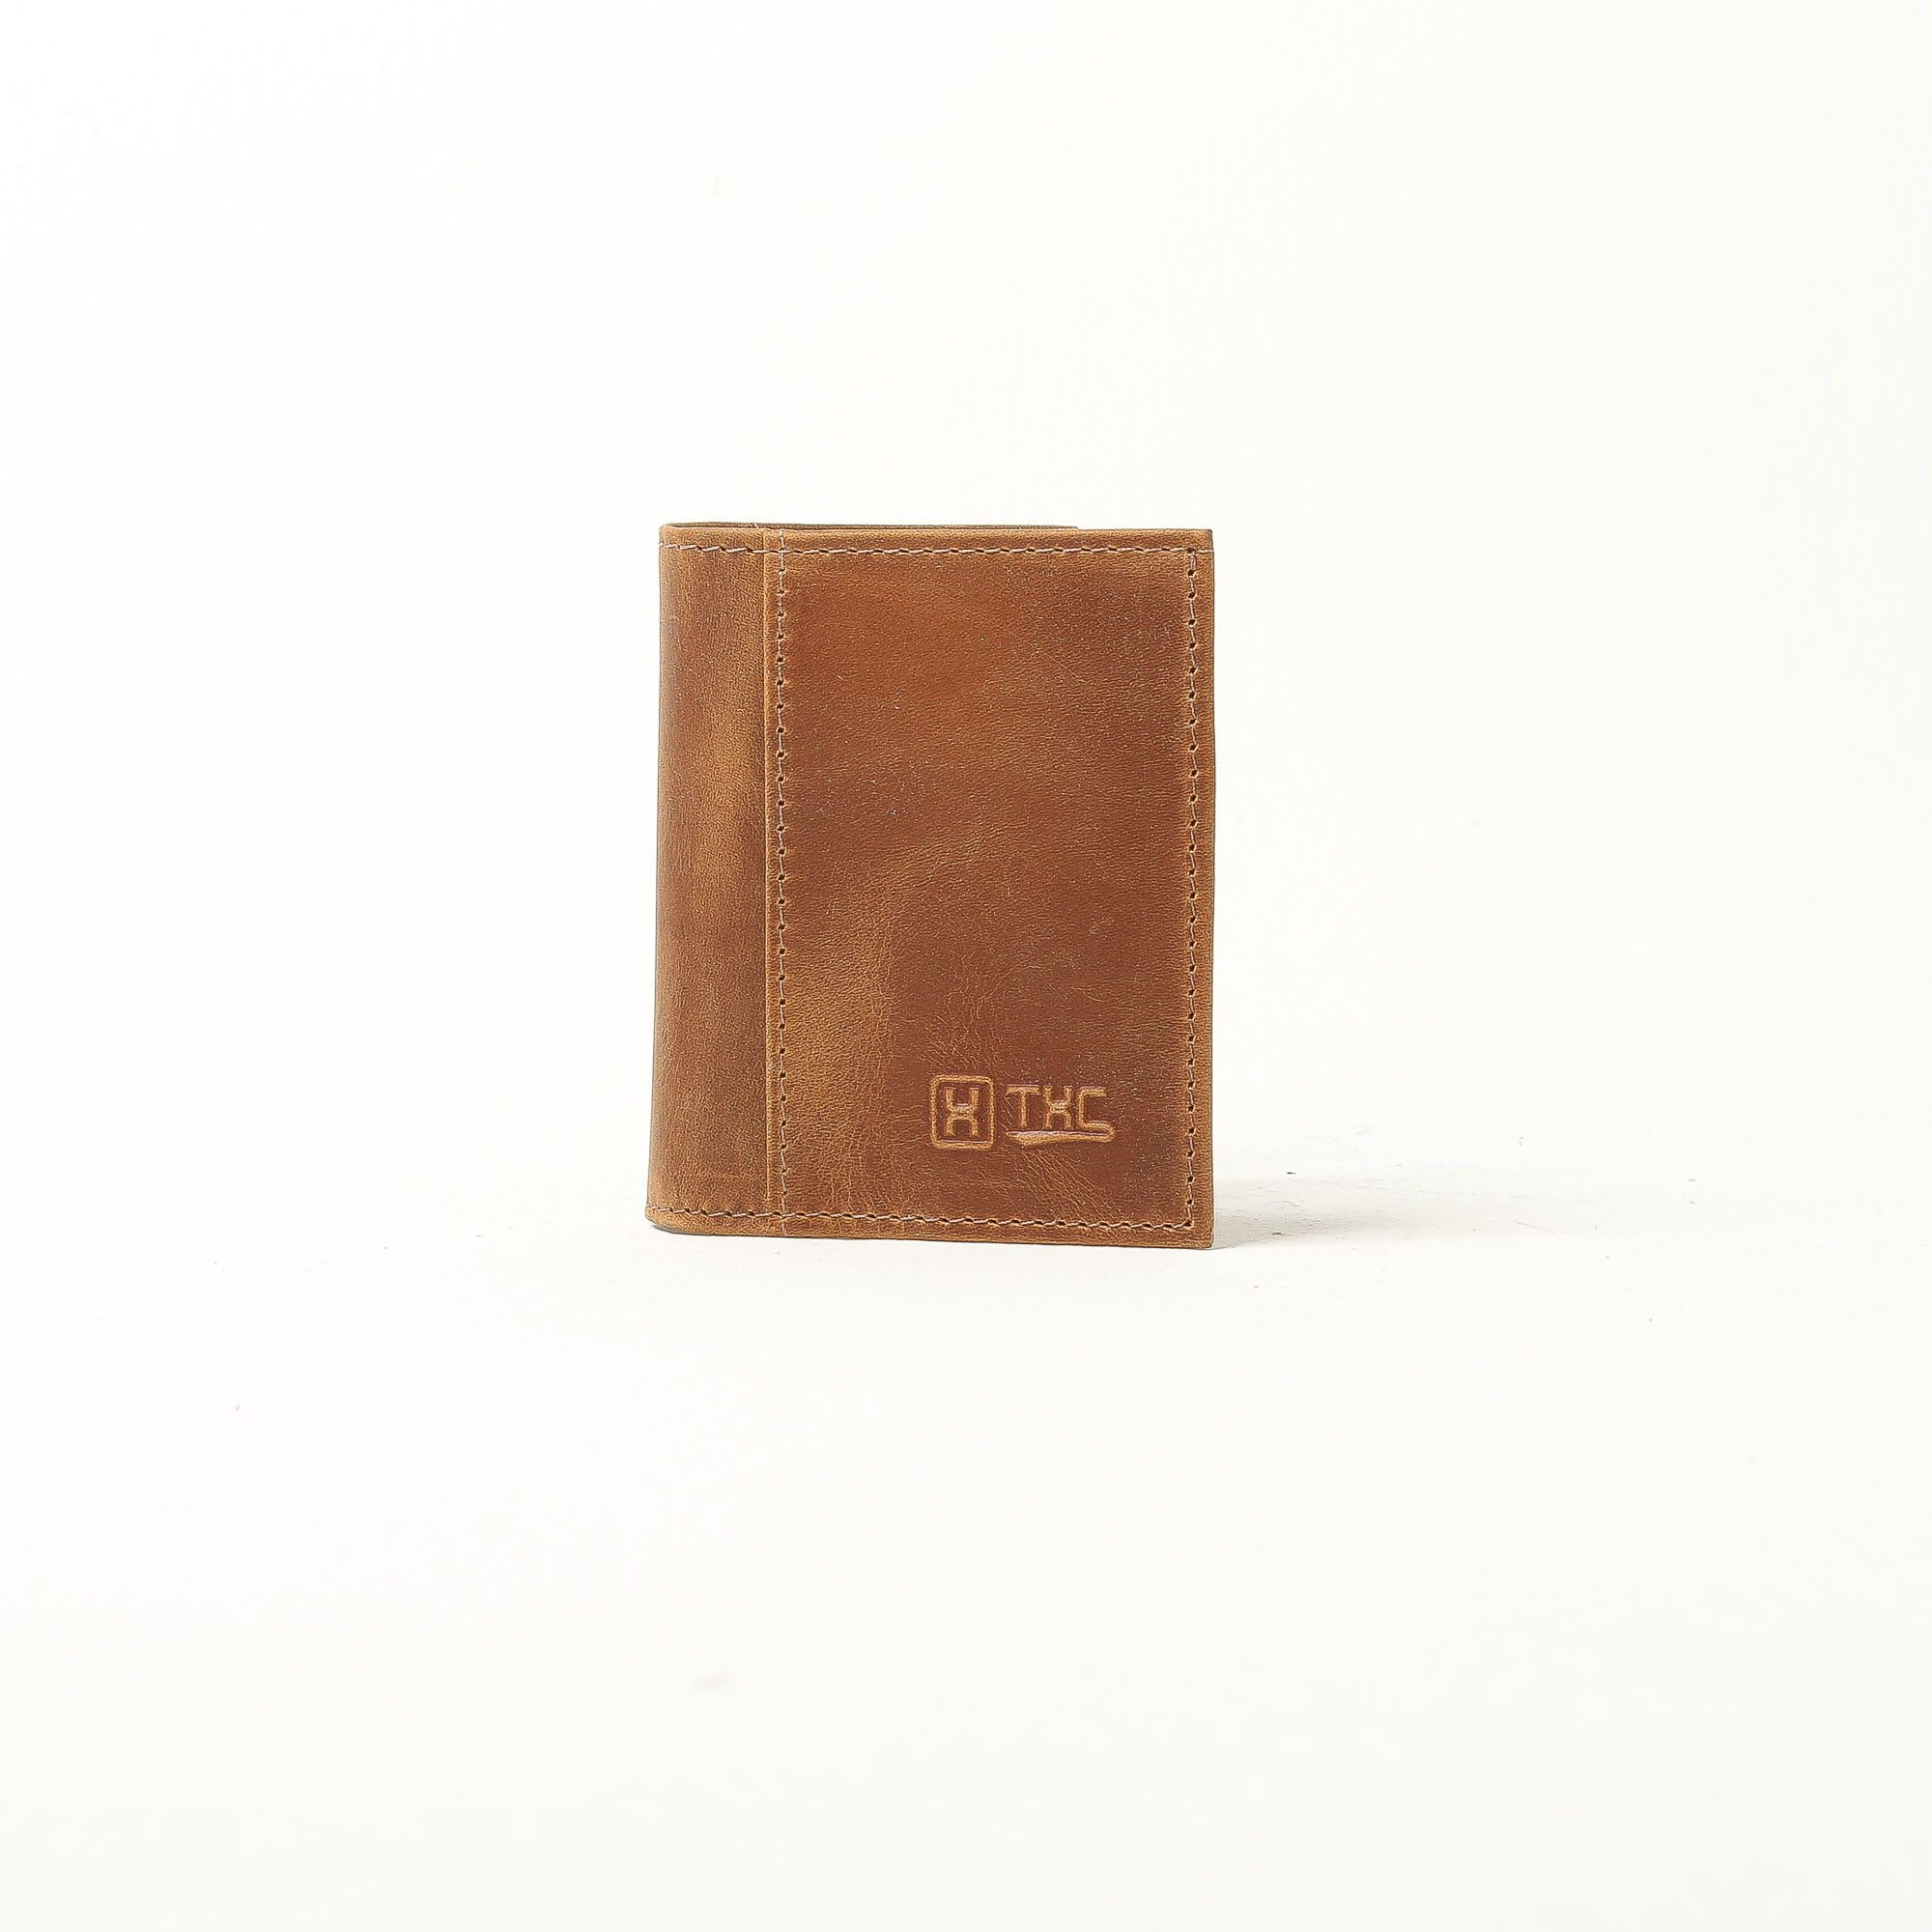 Carteira TXC 11028